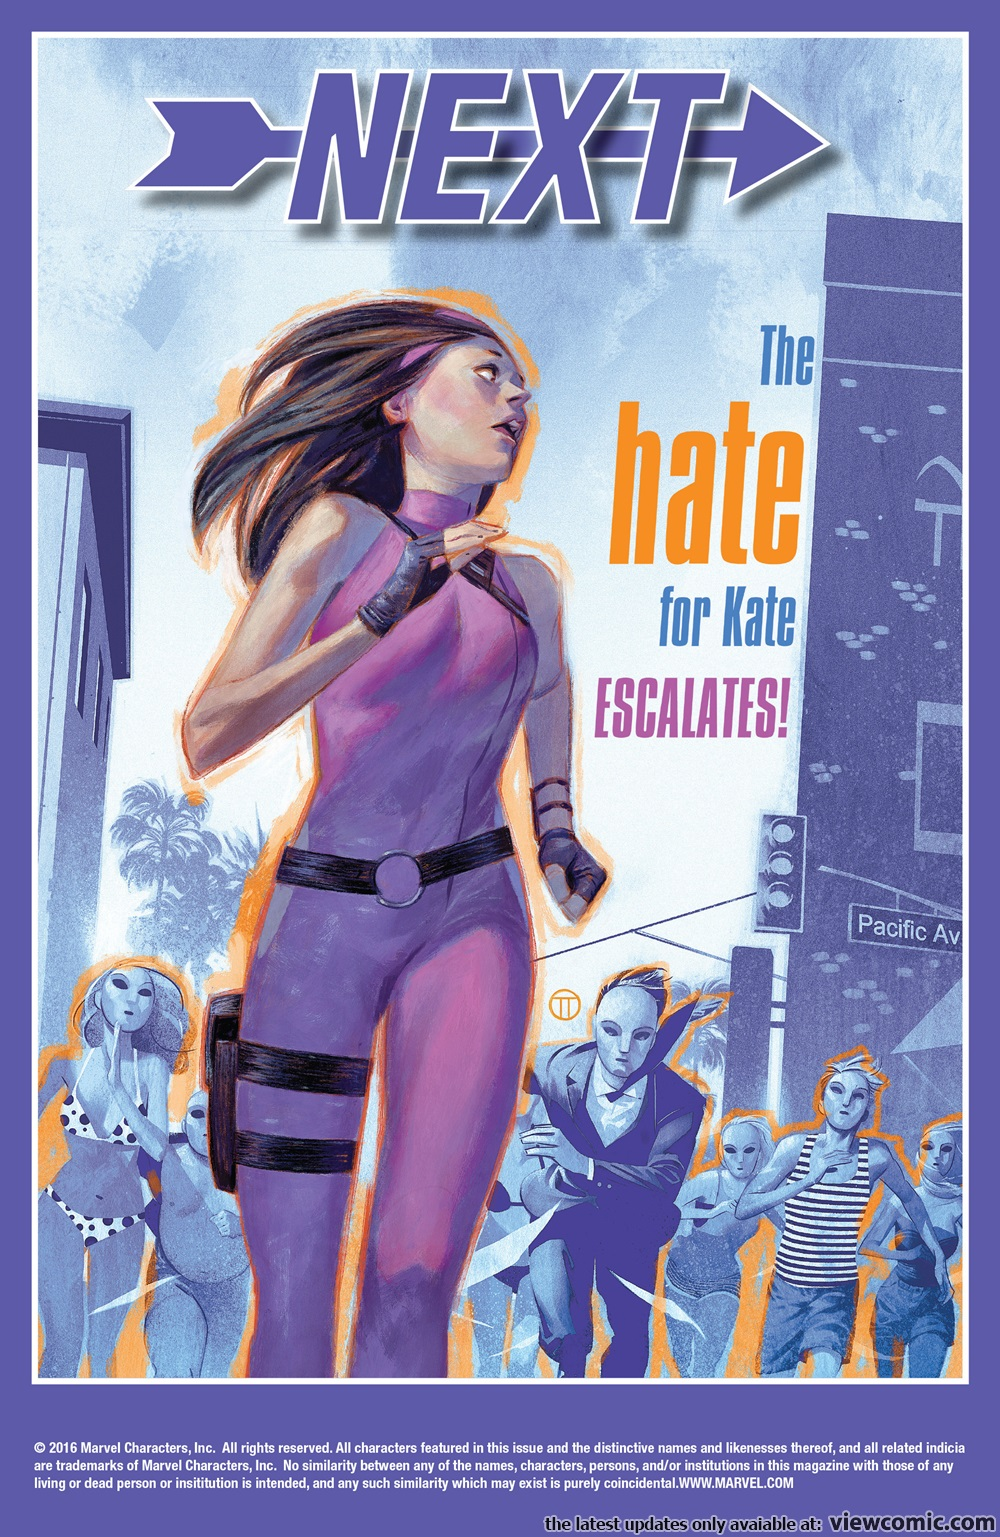 Read Comics Online | View Comic 2019 - Viewcomic reading comics